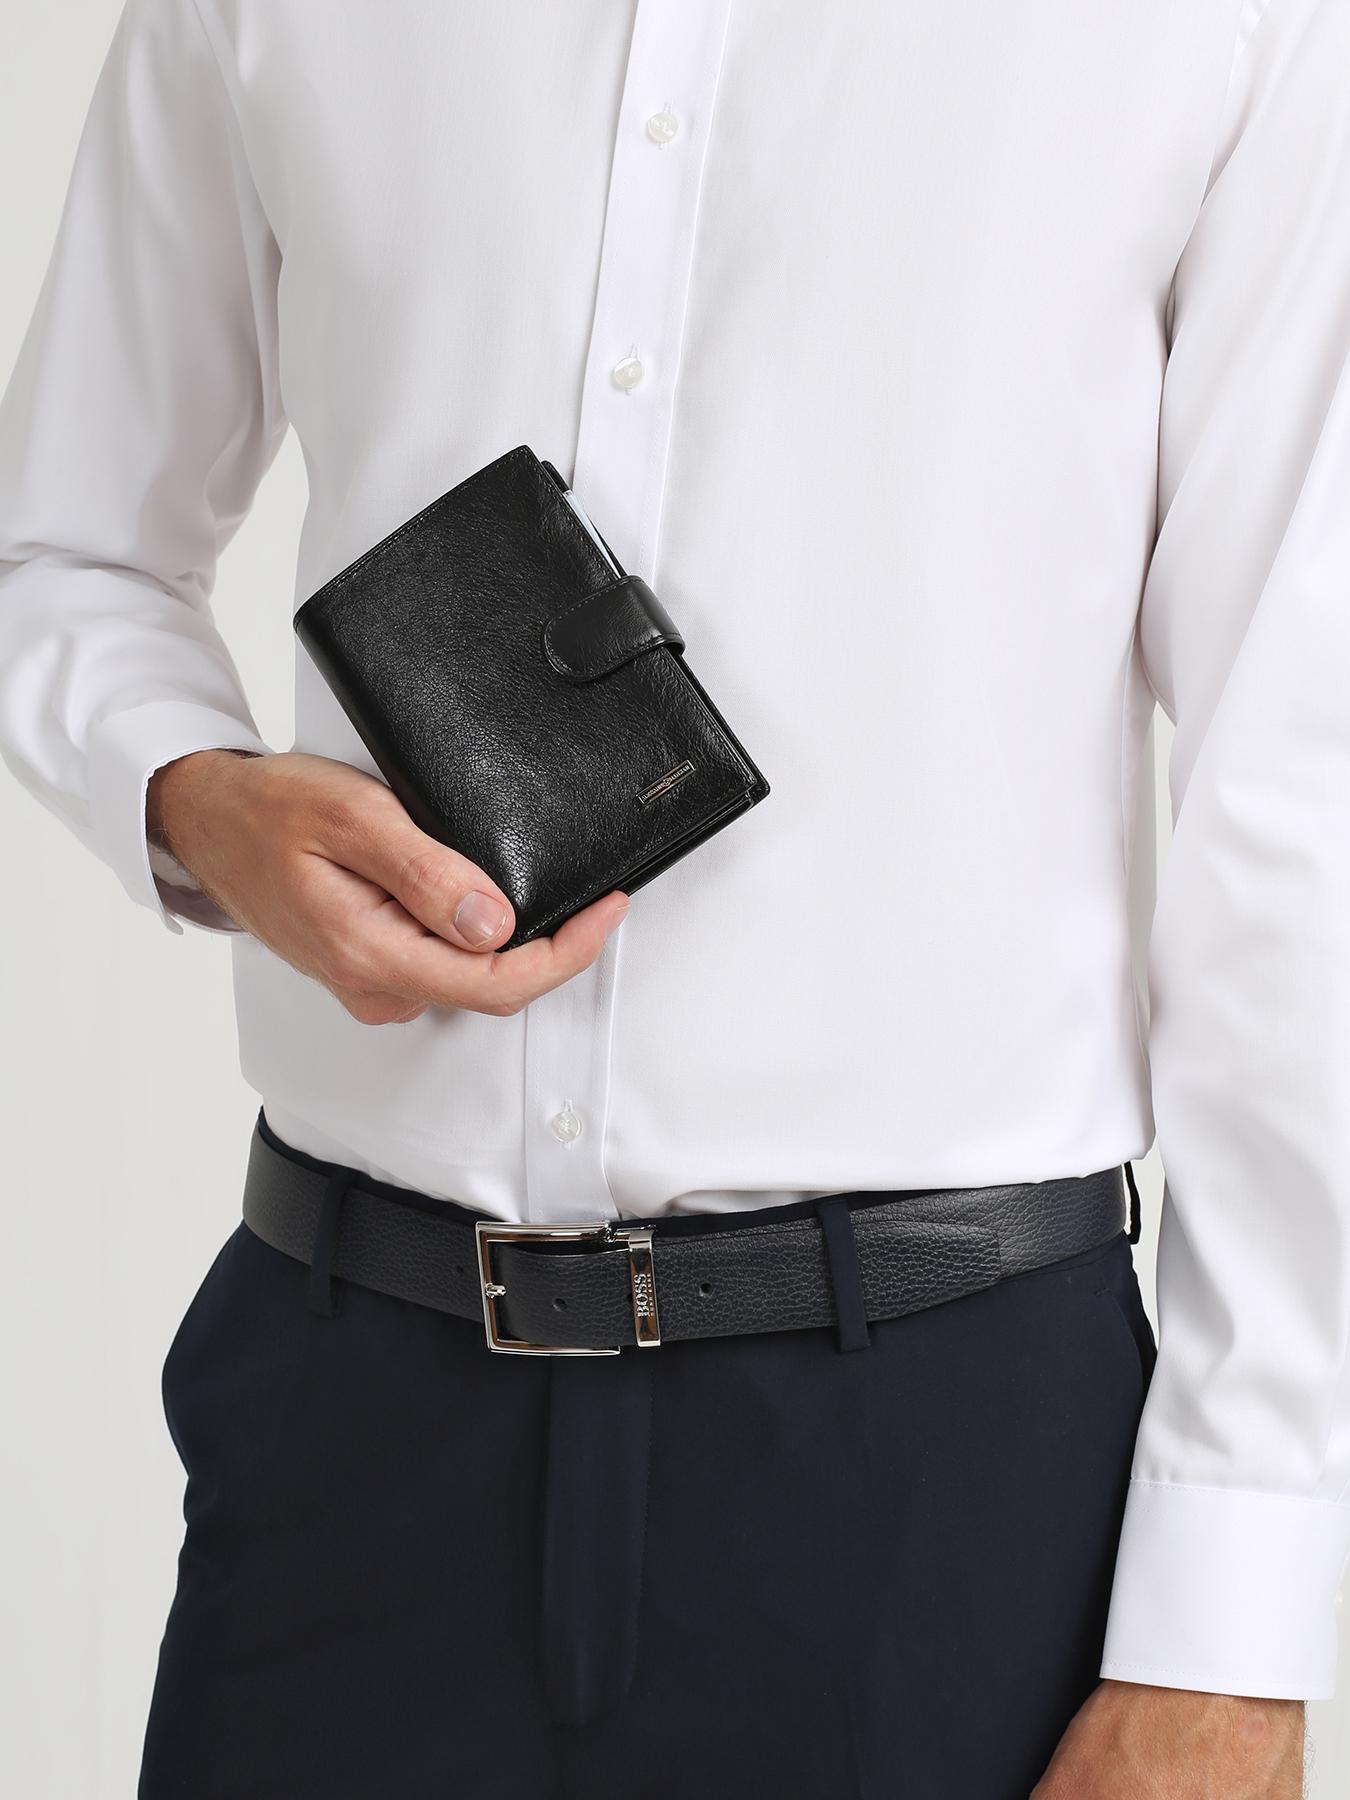 цена на Кошелек Alessandro Manzoni Кожаный кошелек